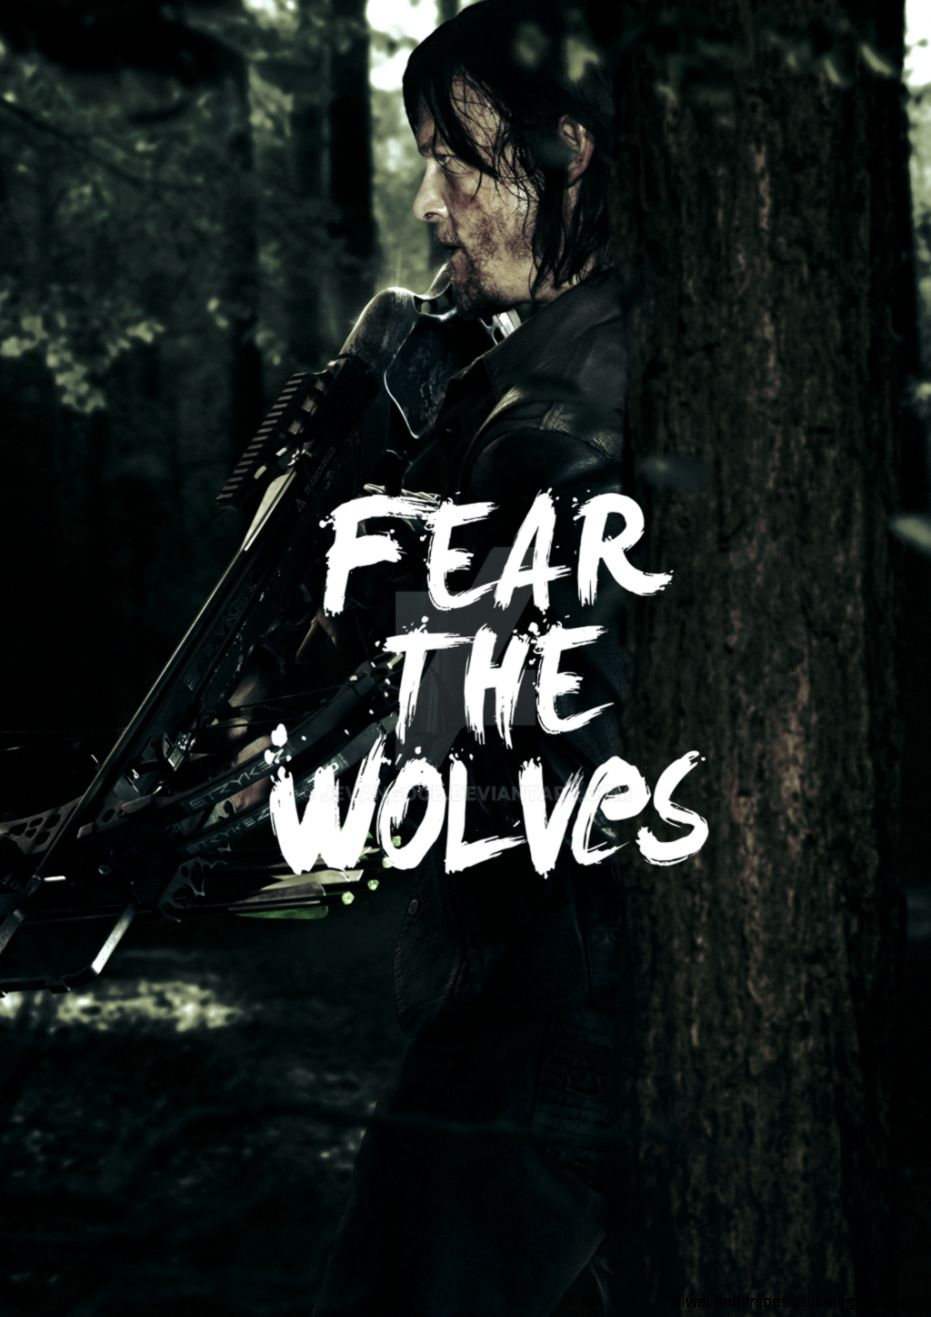 The Walking Dead Poster Art Hd Wallpaper All Wallpapers Desktop